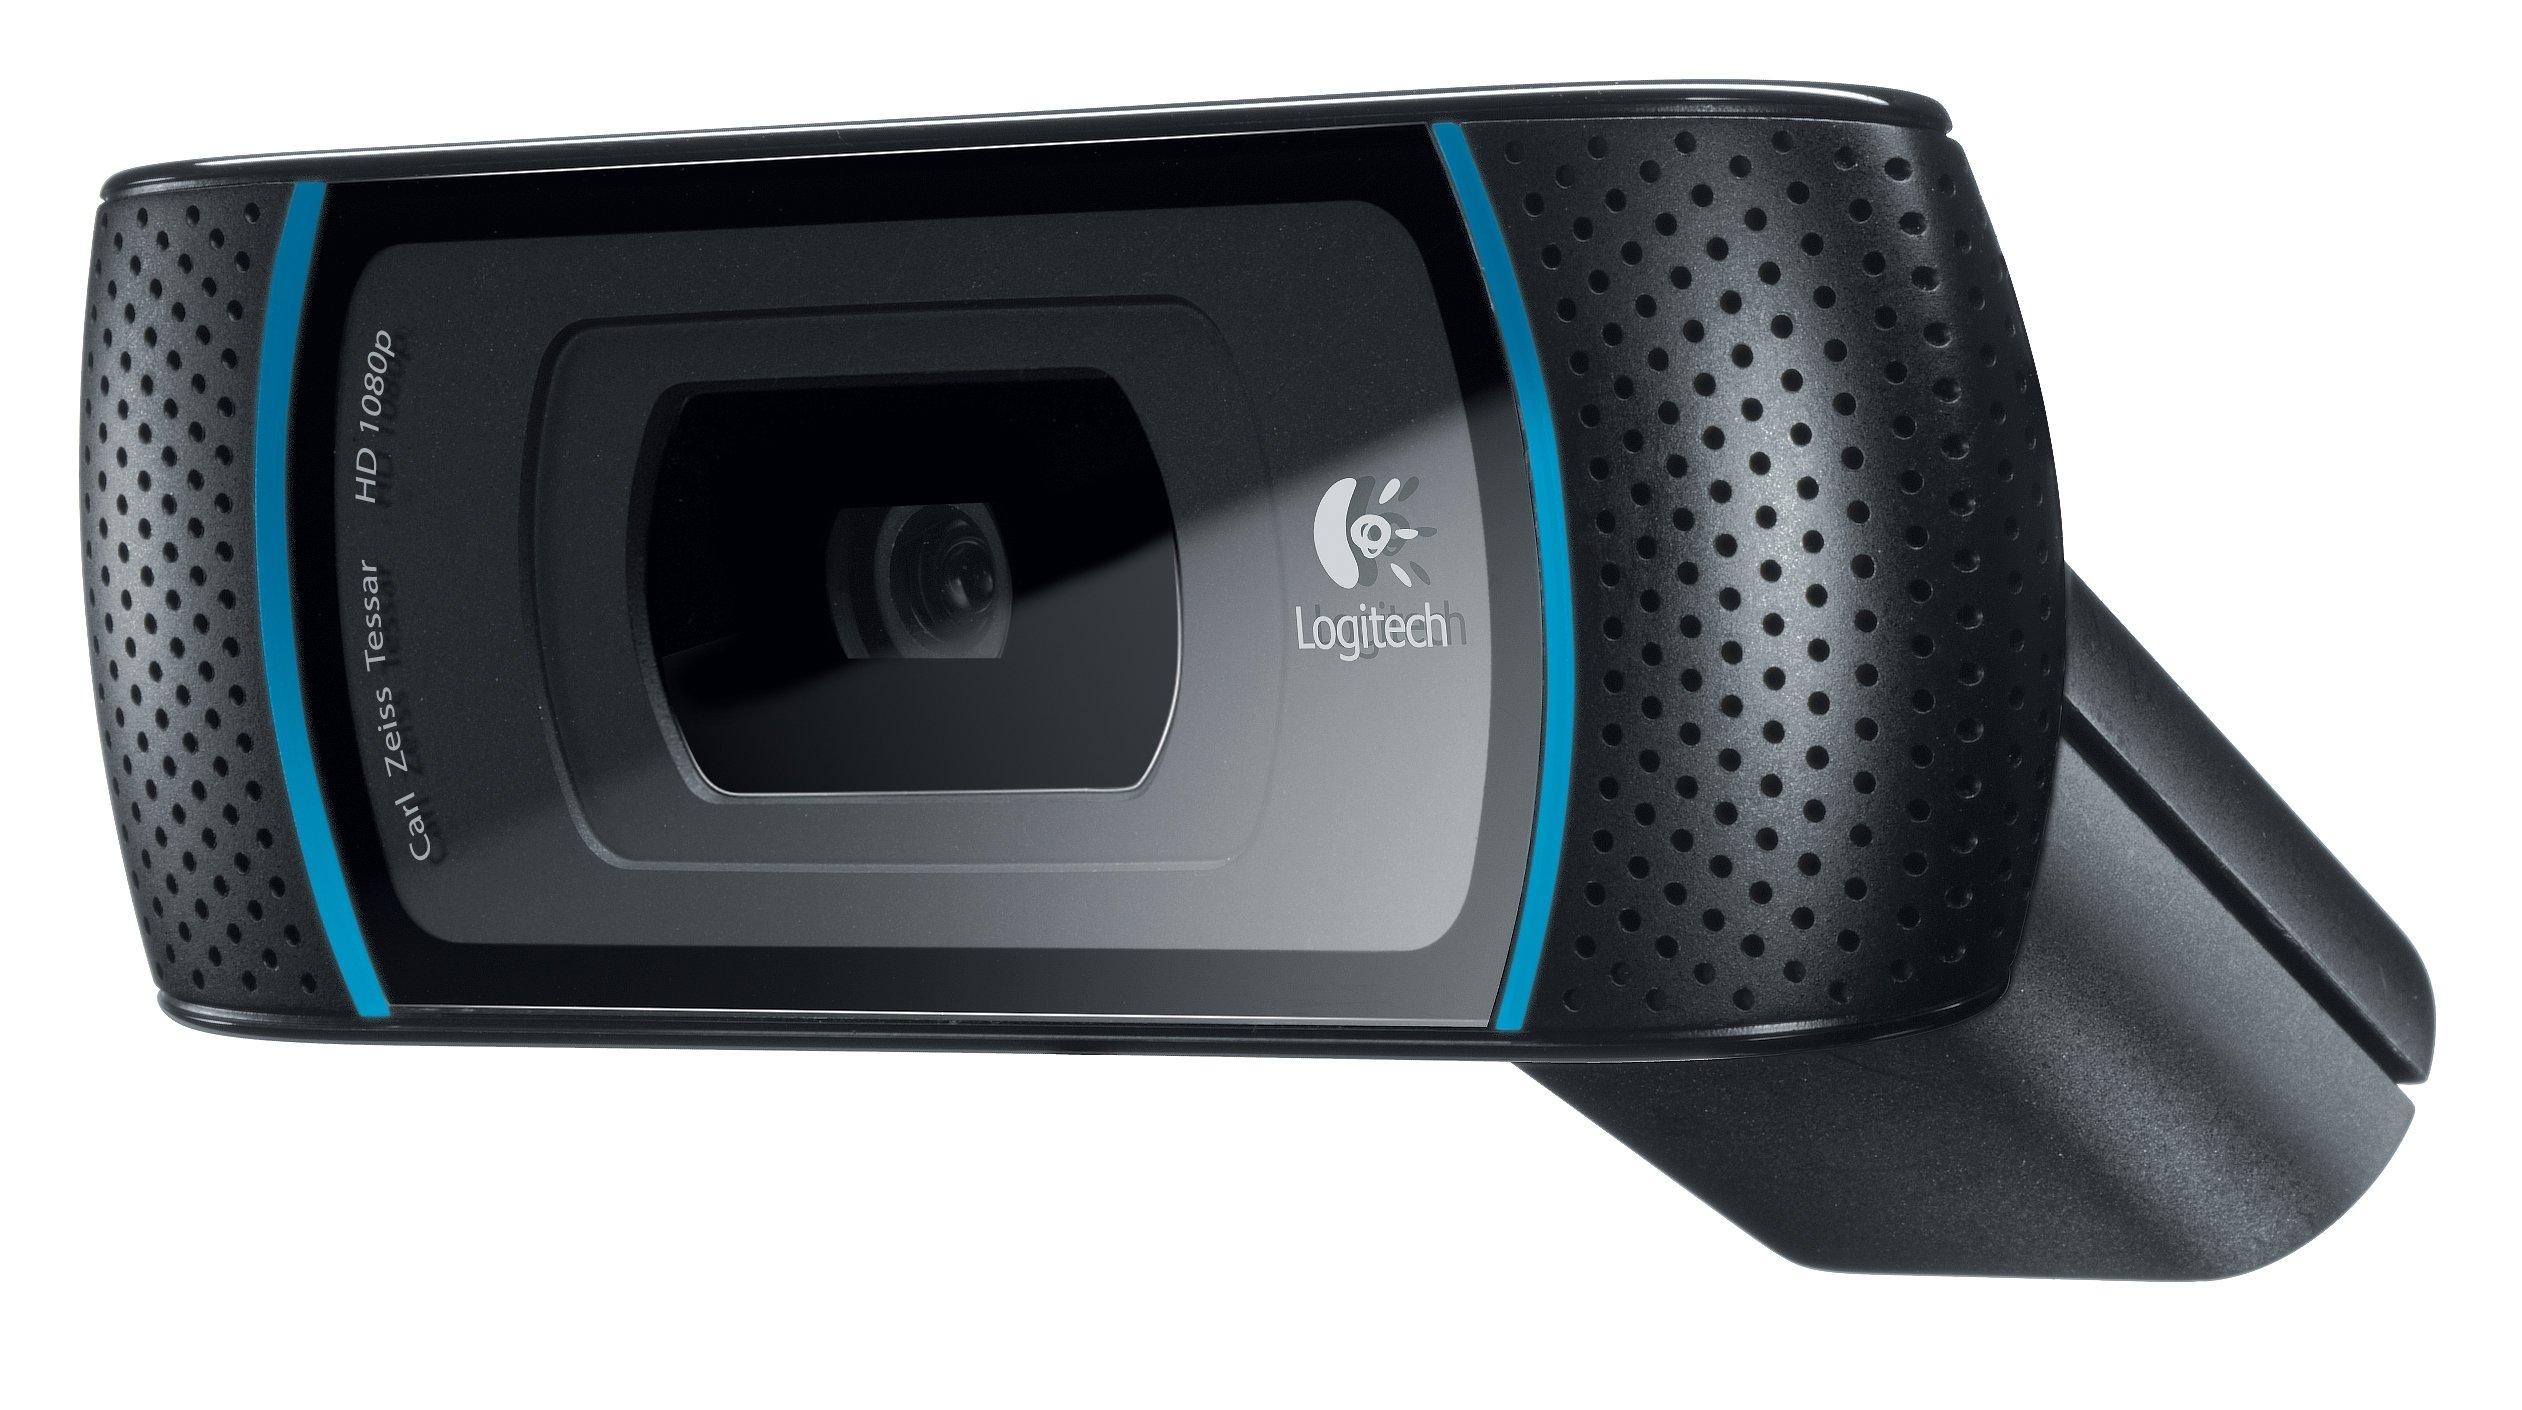 NEW Logitech HD Pro Webcam C910 (Cameras & Frames) by Logitech (Image #2)